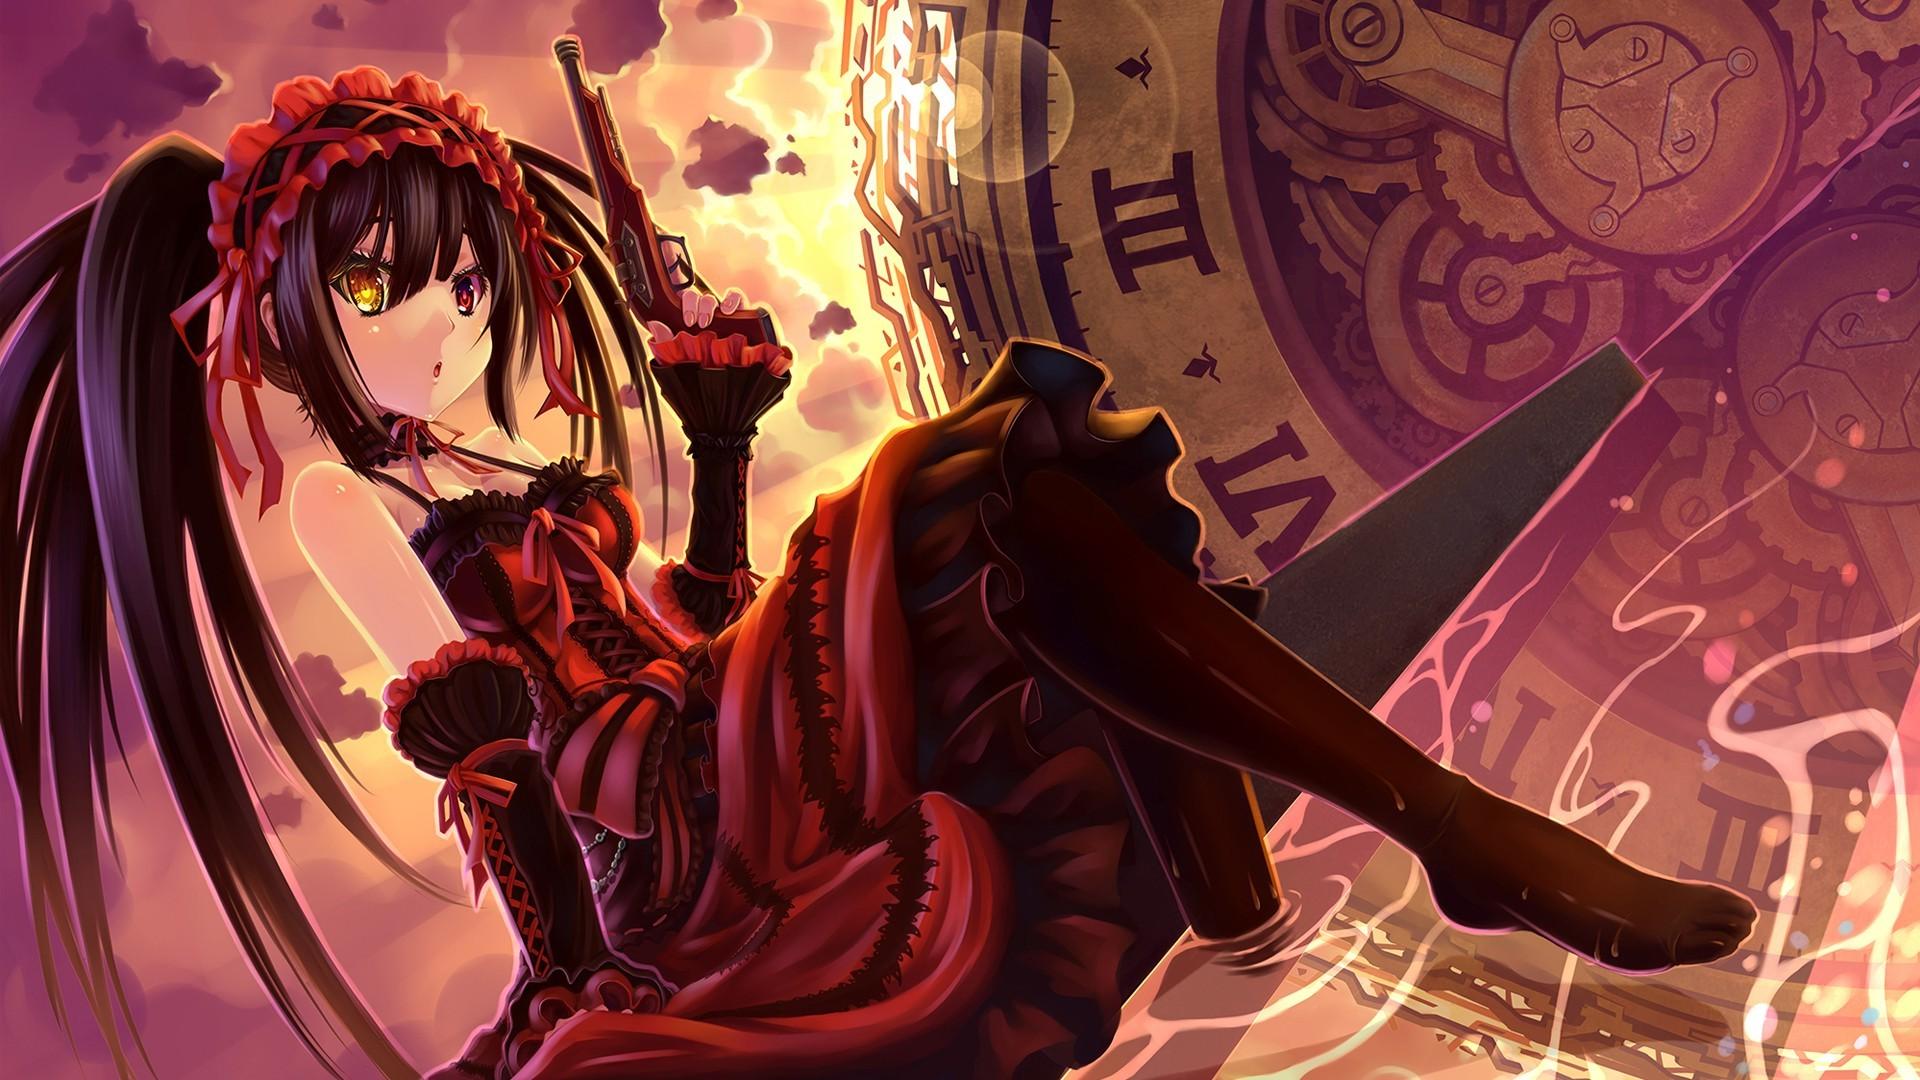 anime Anime Girls Tokisaki Kurumi Date A Live Wallpapers HD 1920x1080